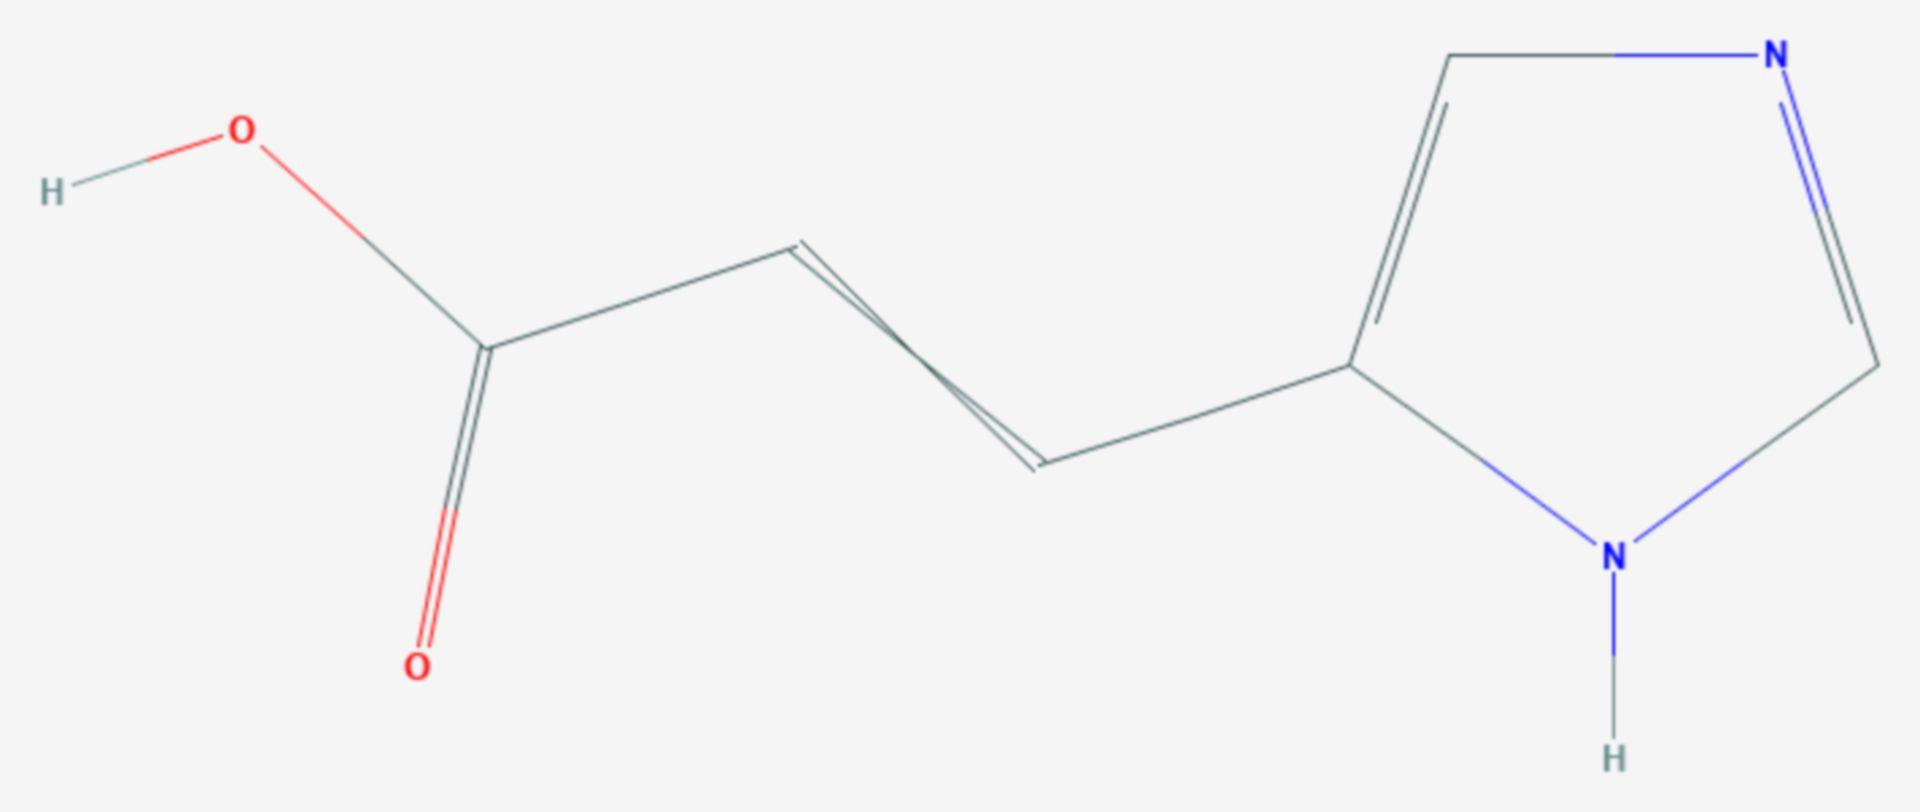 Urocaninsäure (Strukturformel)